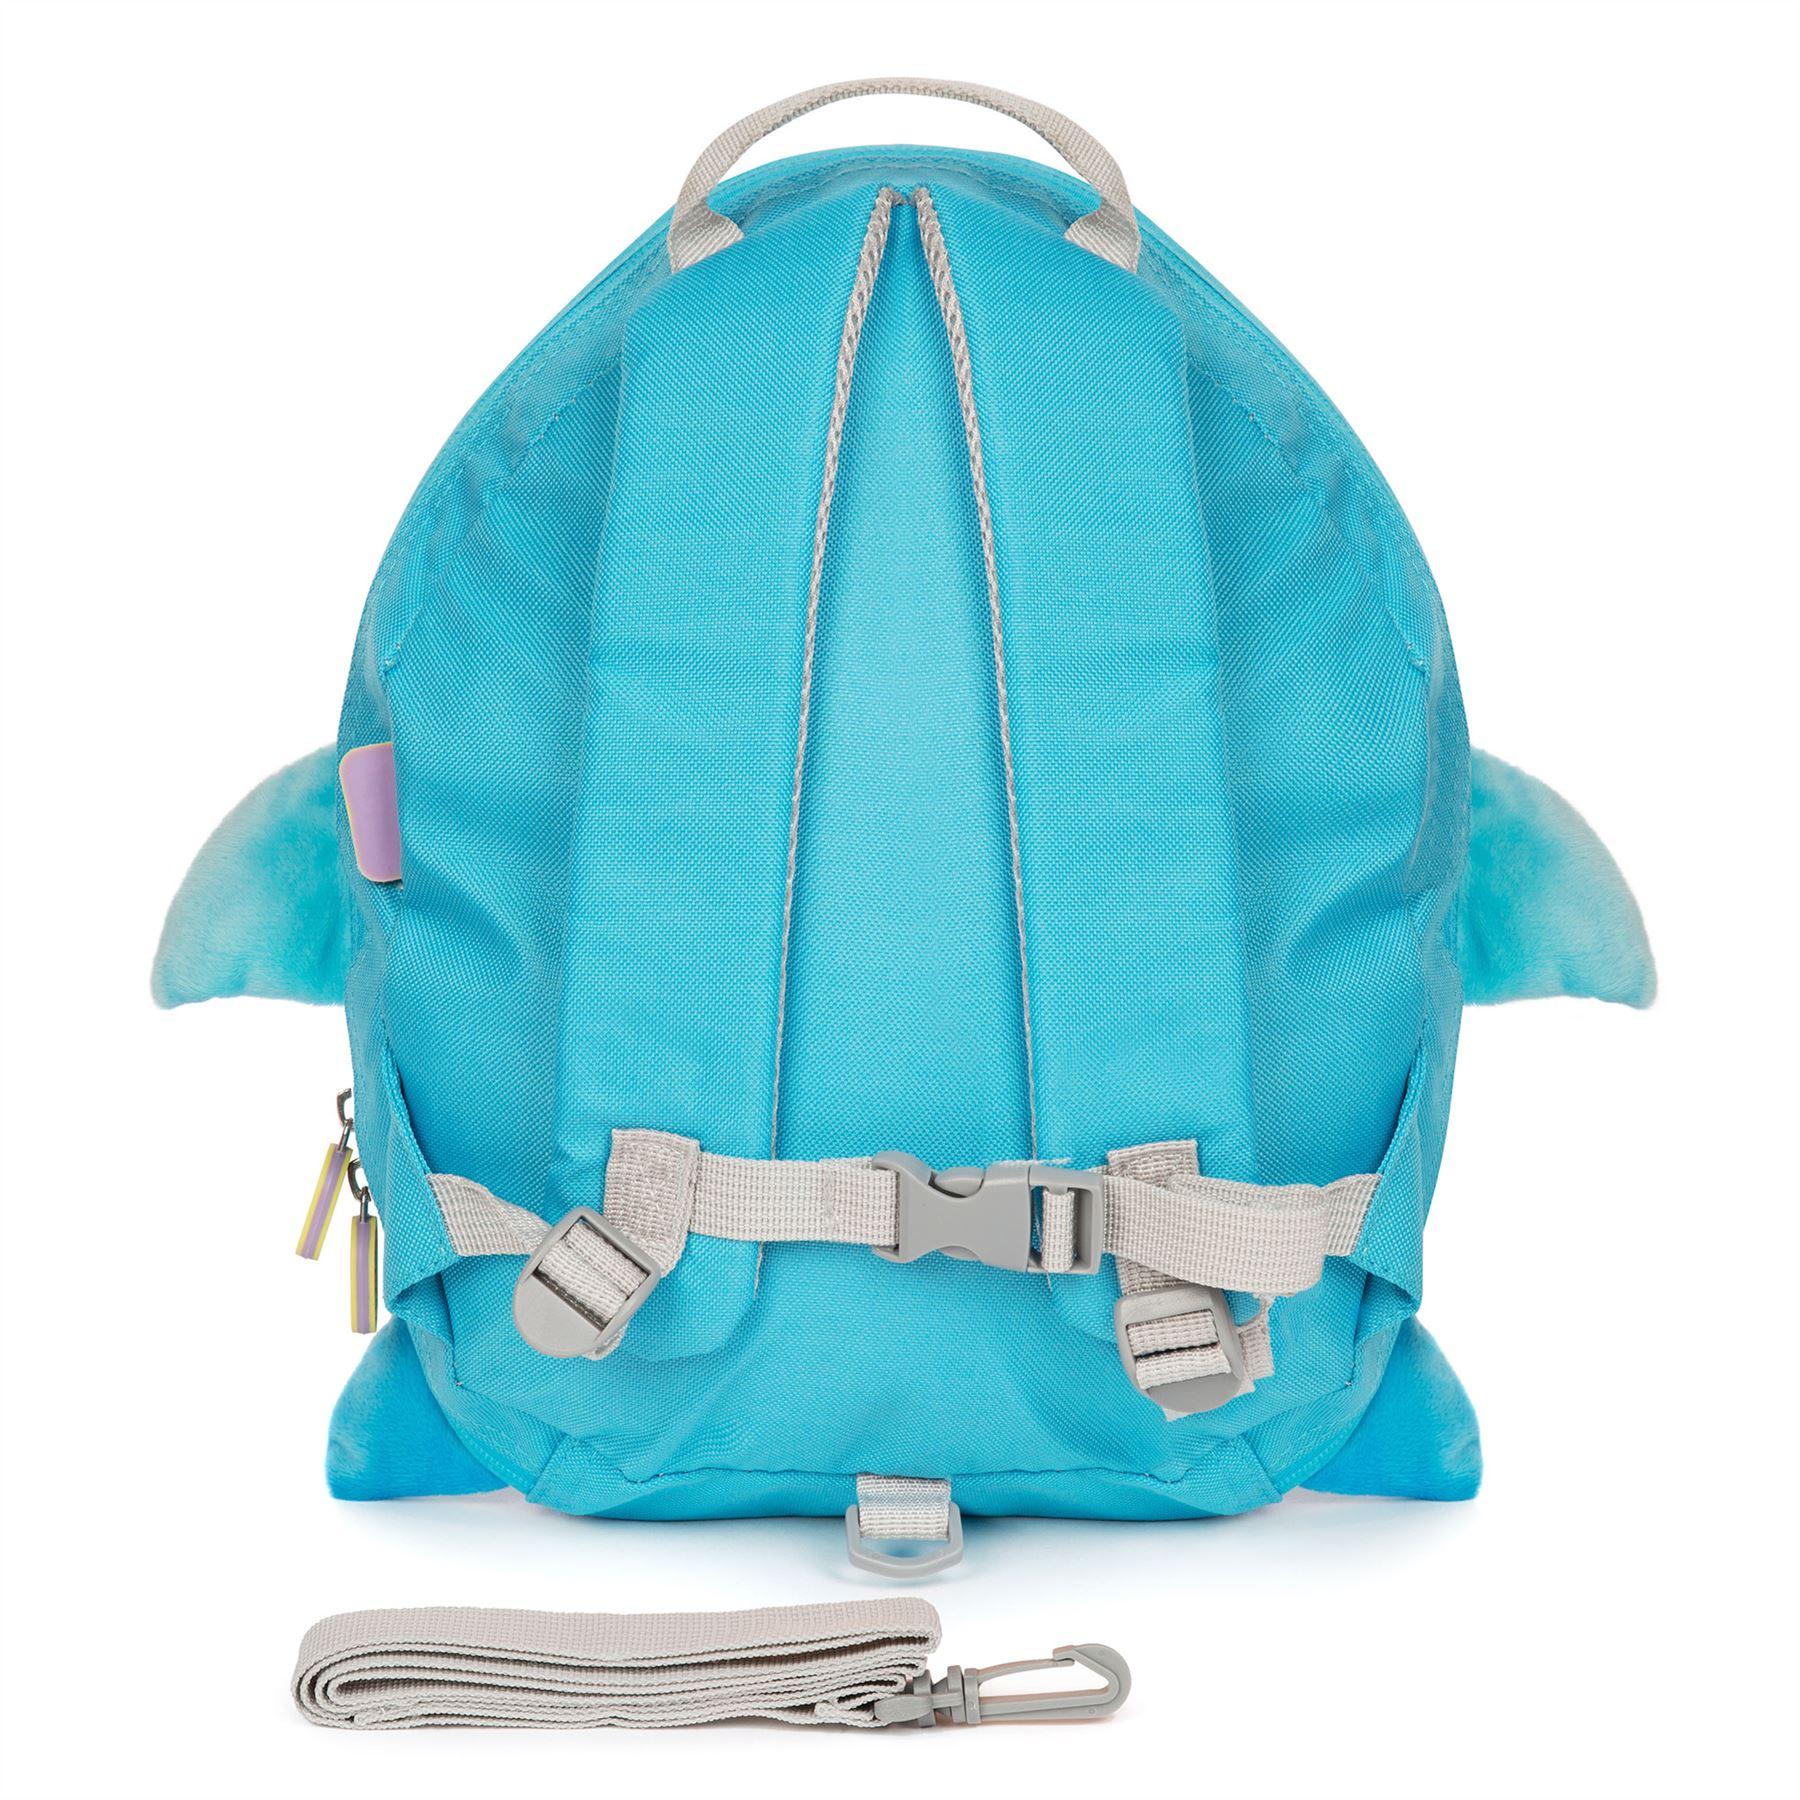 Boppi Tiny Trekker Enfants Sac à dos de voyage sac de vacances Back to School sac à dos